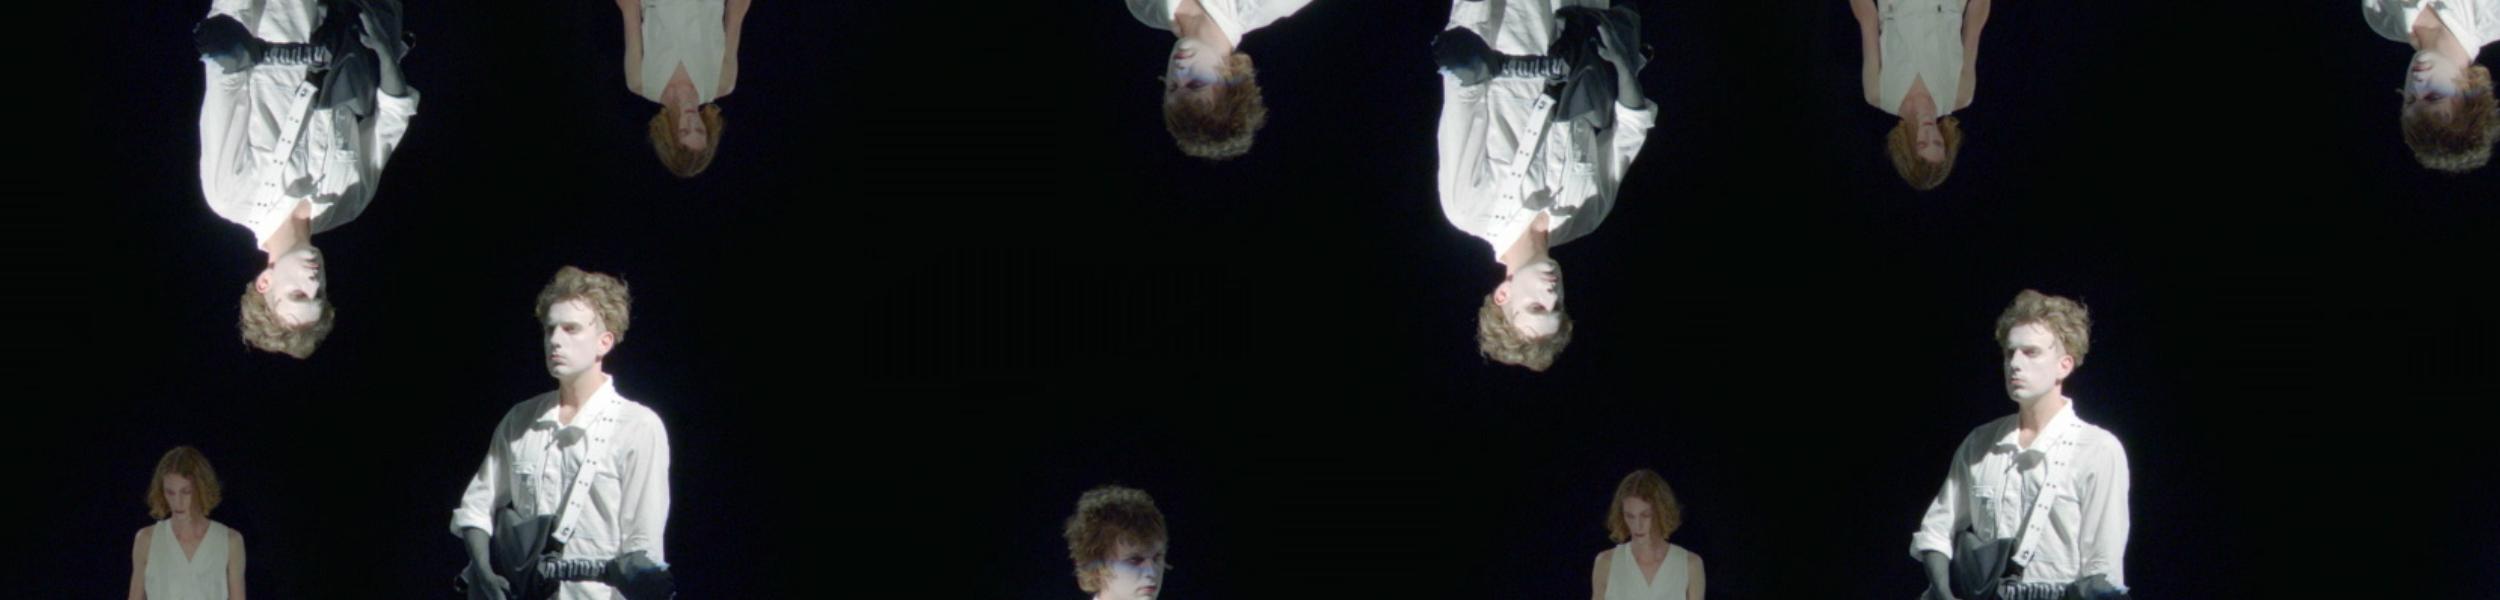 Methyl Ethel - New Album 'Everything Is Forgotten', Plus 'Ubu' Video